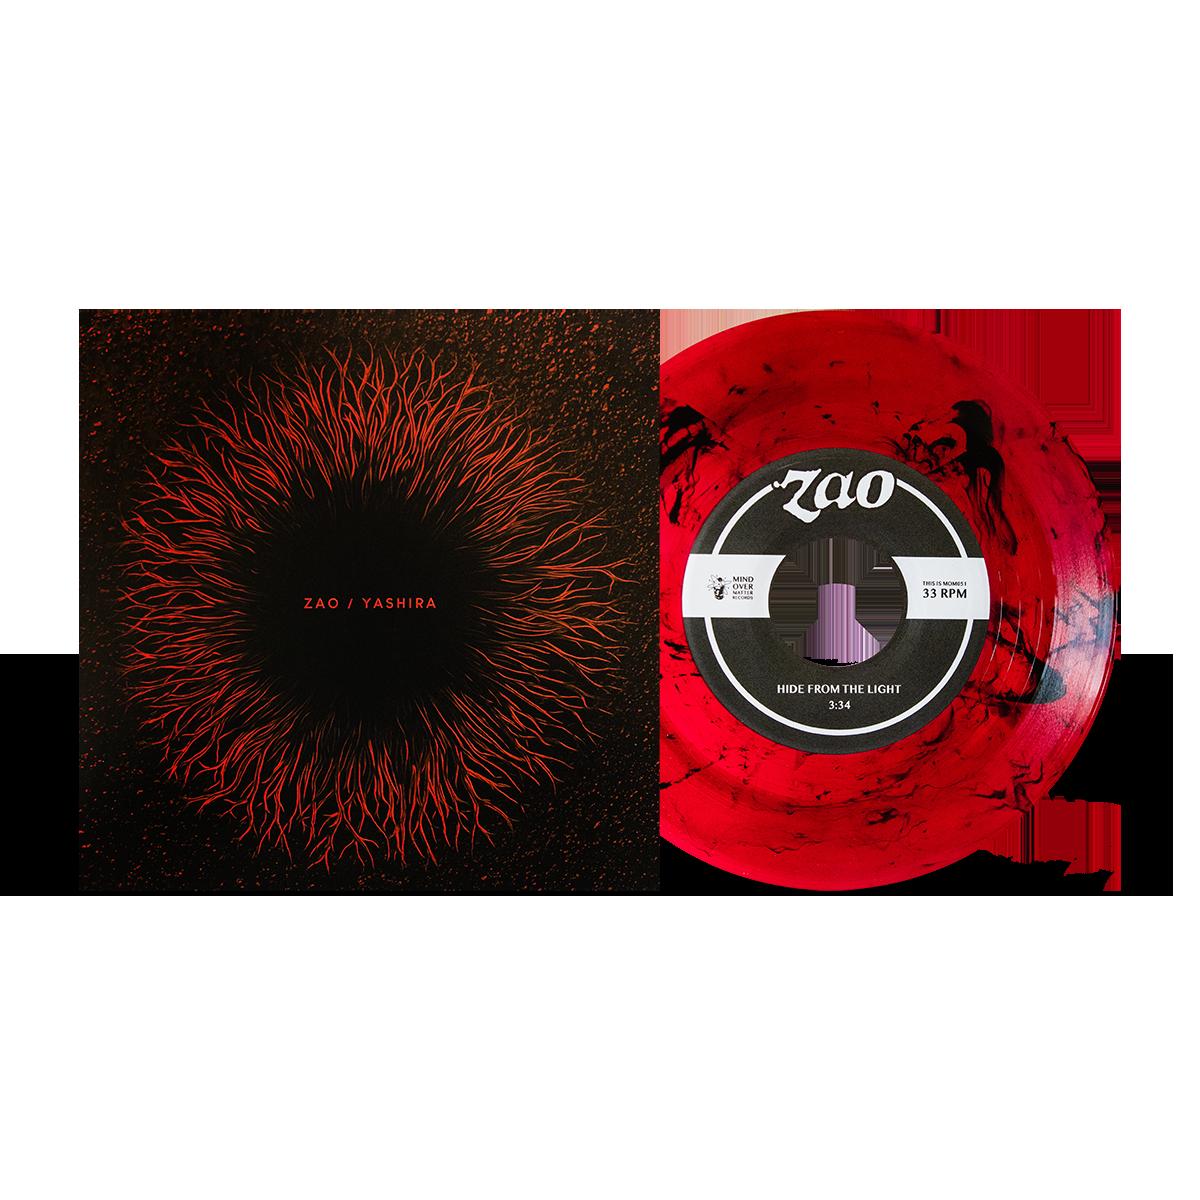 zao-yashira-red---1200x.png